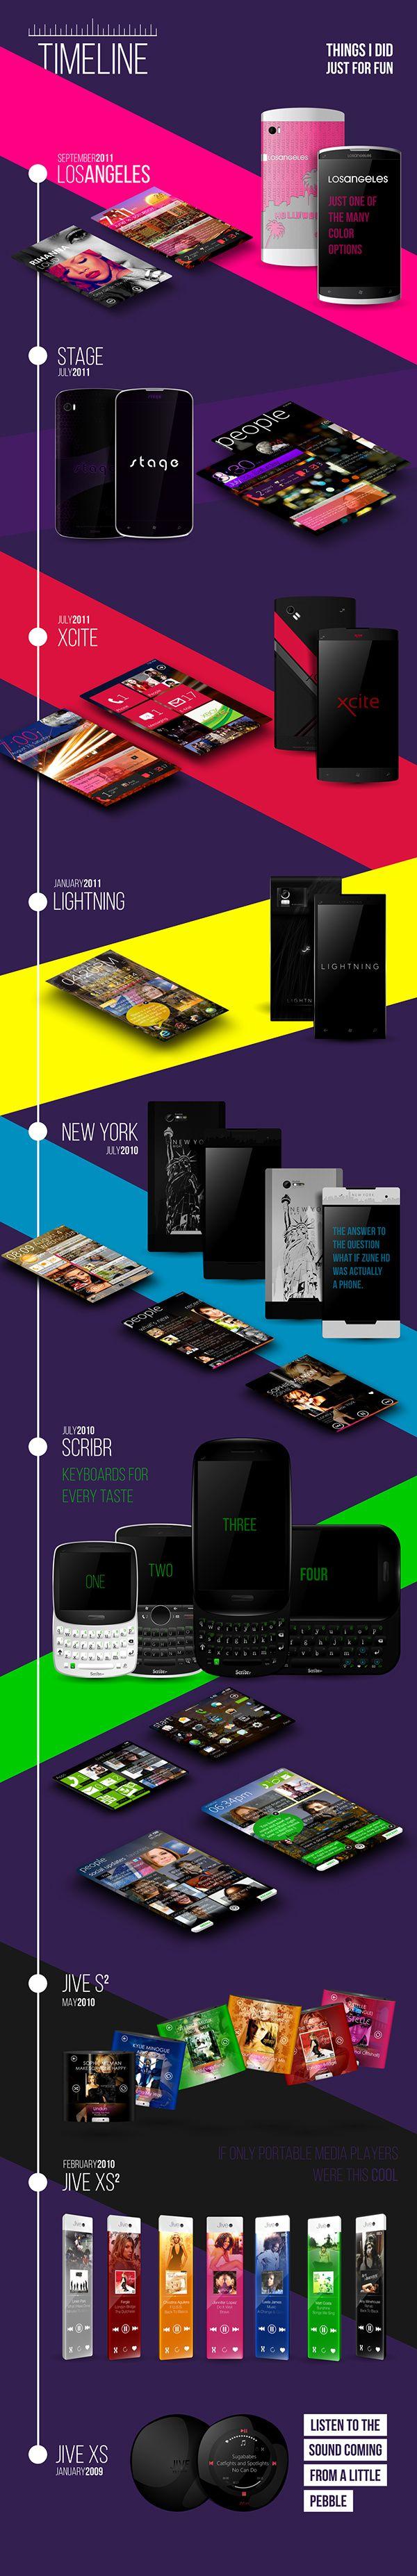 TIMELINE : My Design Concepts on Behance #ui #ux #design #smartphone #concept